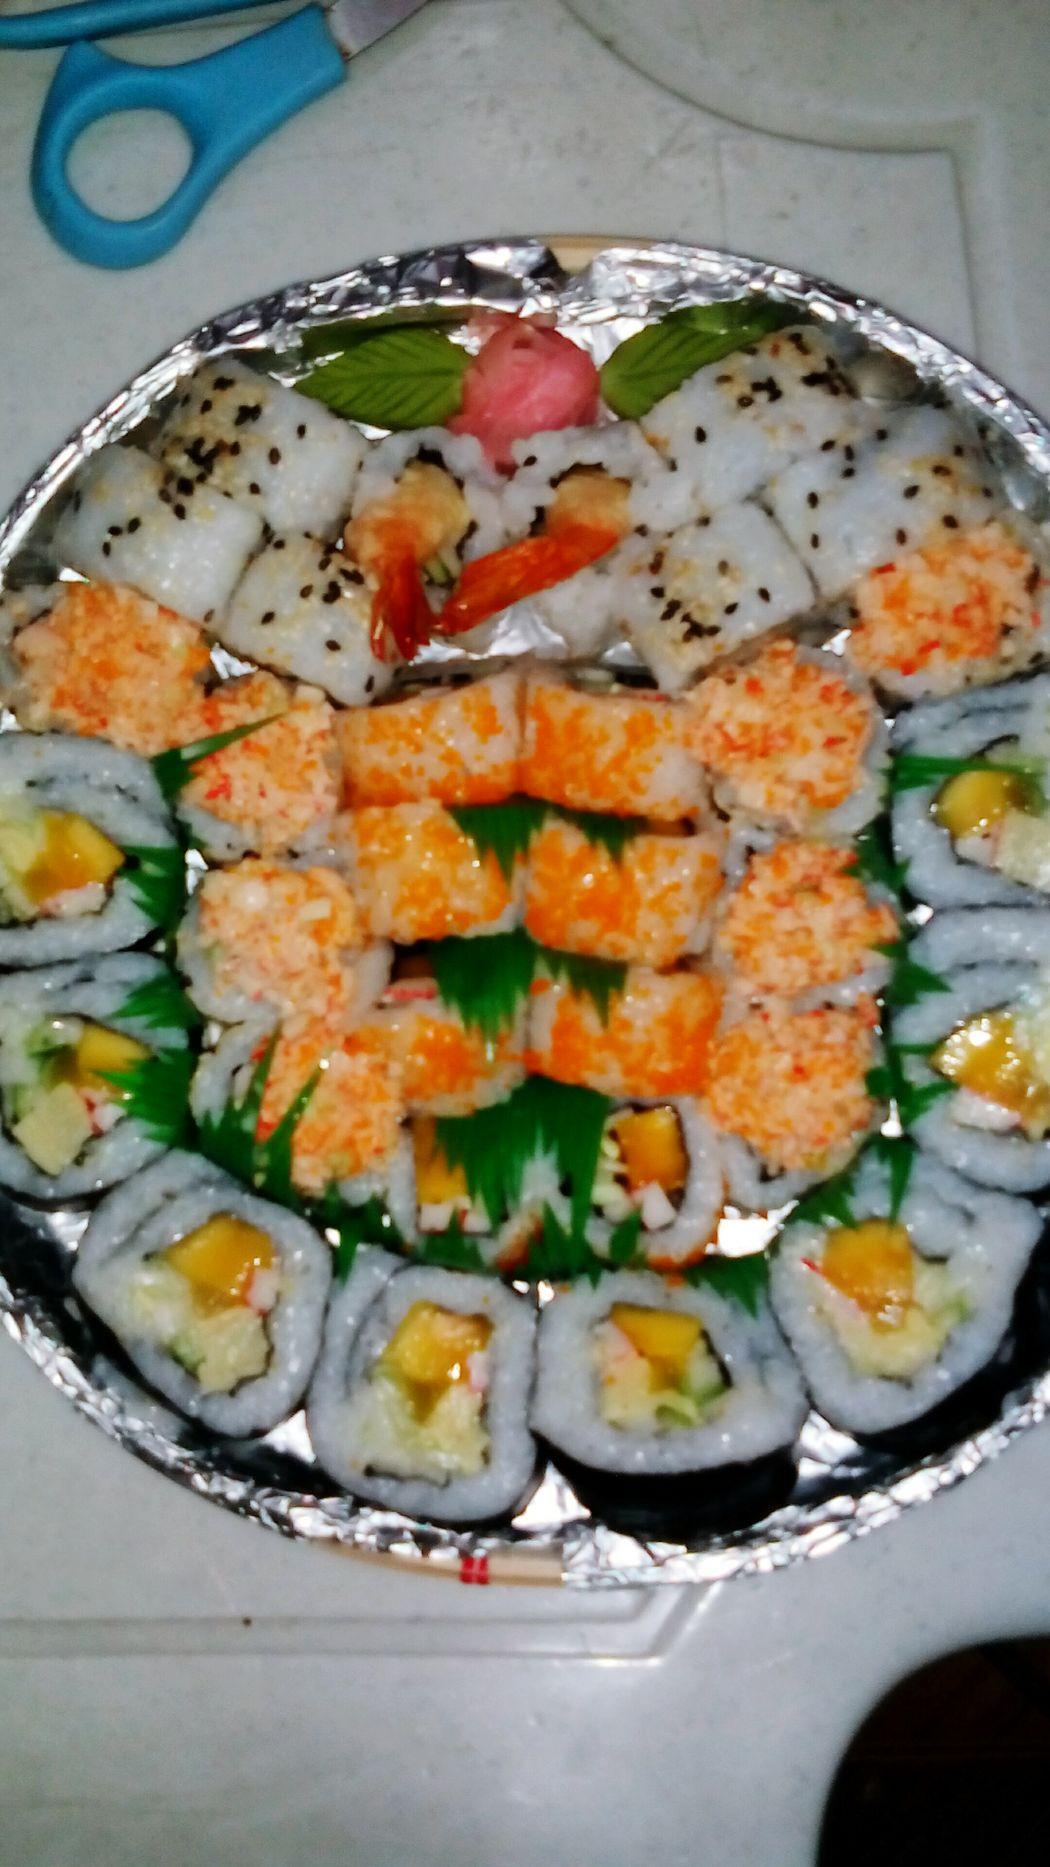 Foodtrip. First Eyeem Photo